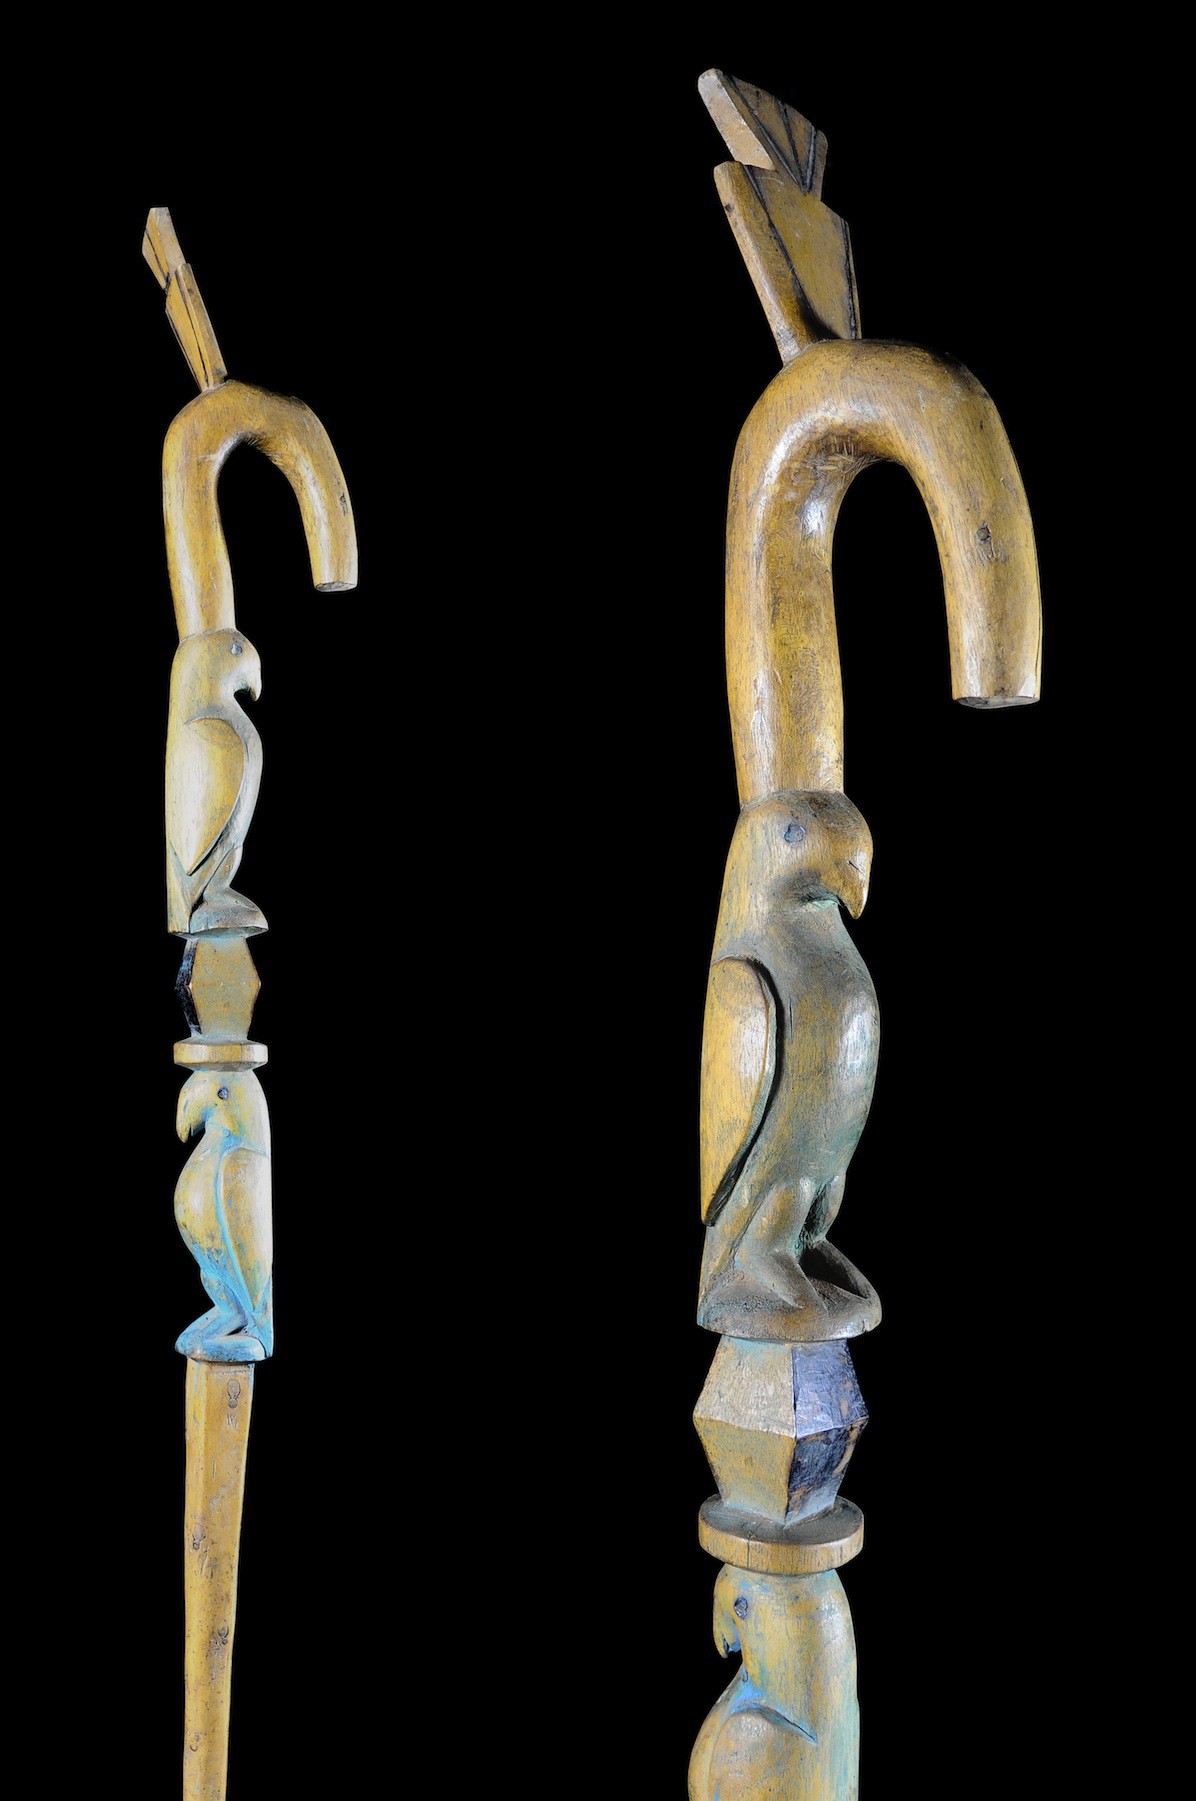 Canne polychrome - Gurunsi - Burkina Faso - Objets de regalia